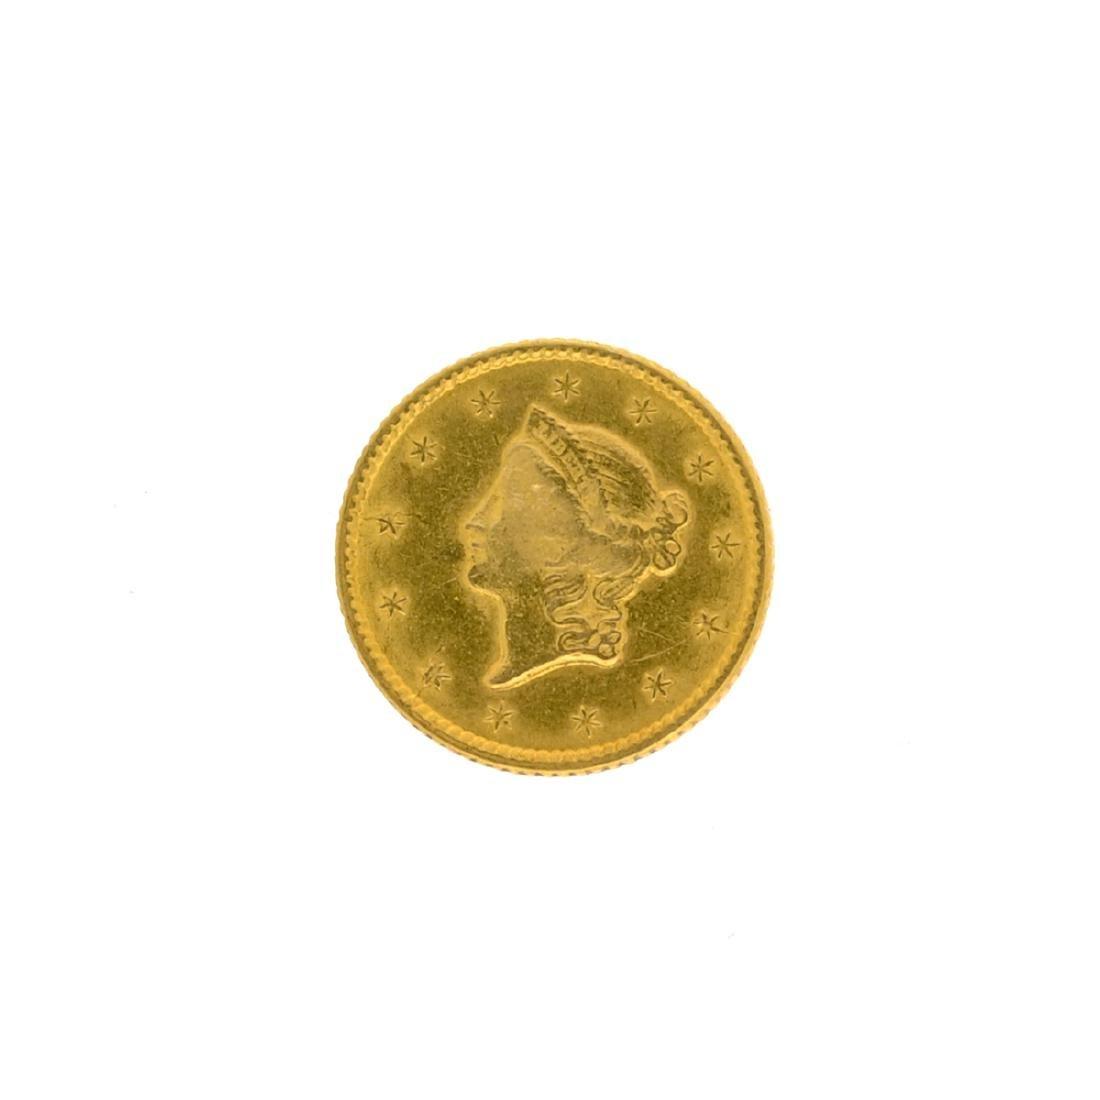 1853 $1 U.S. Liberty Head Gold Coin - 2